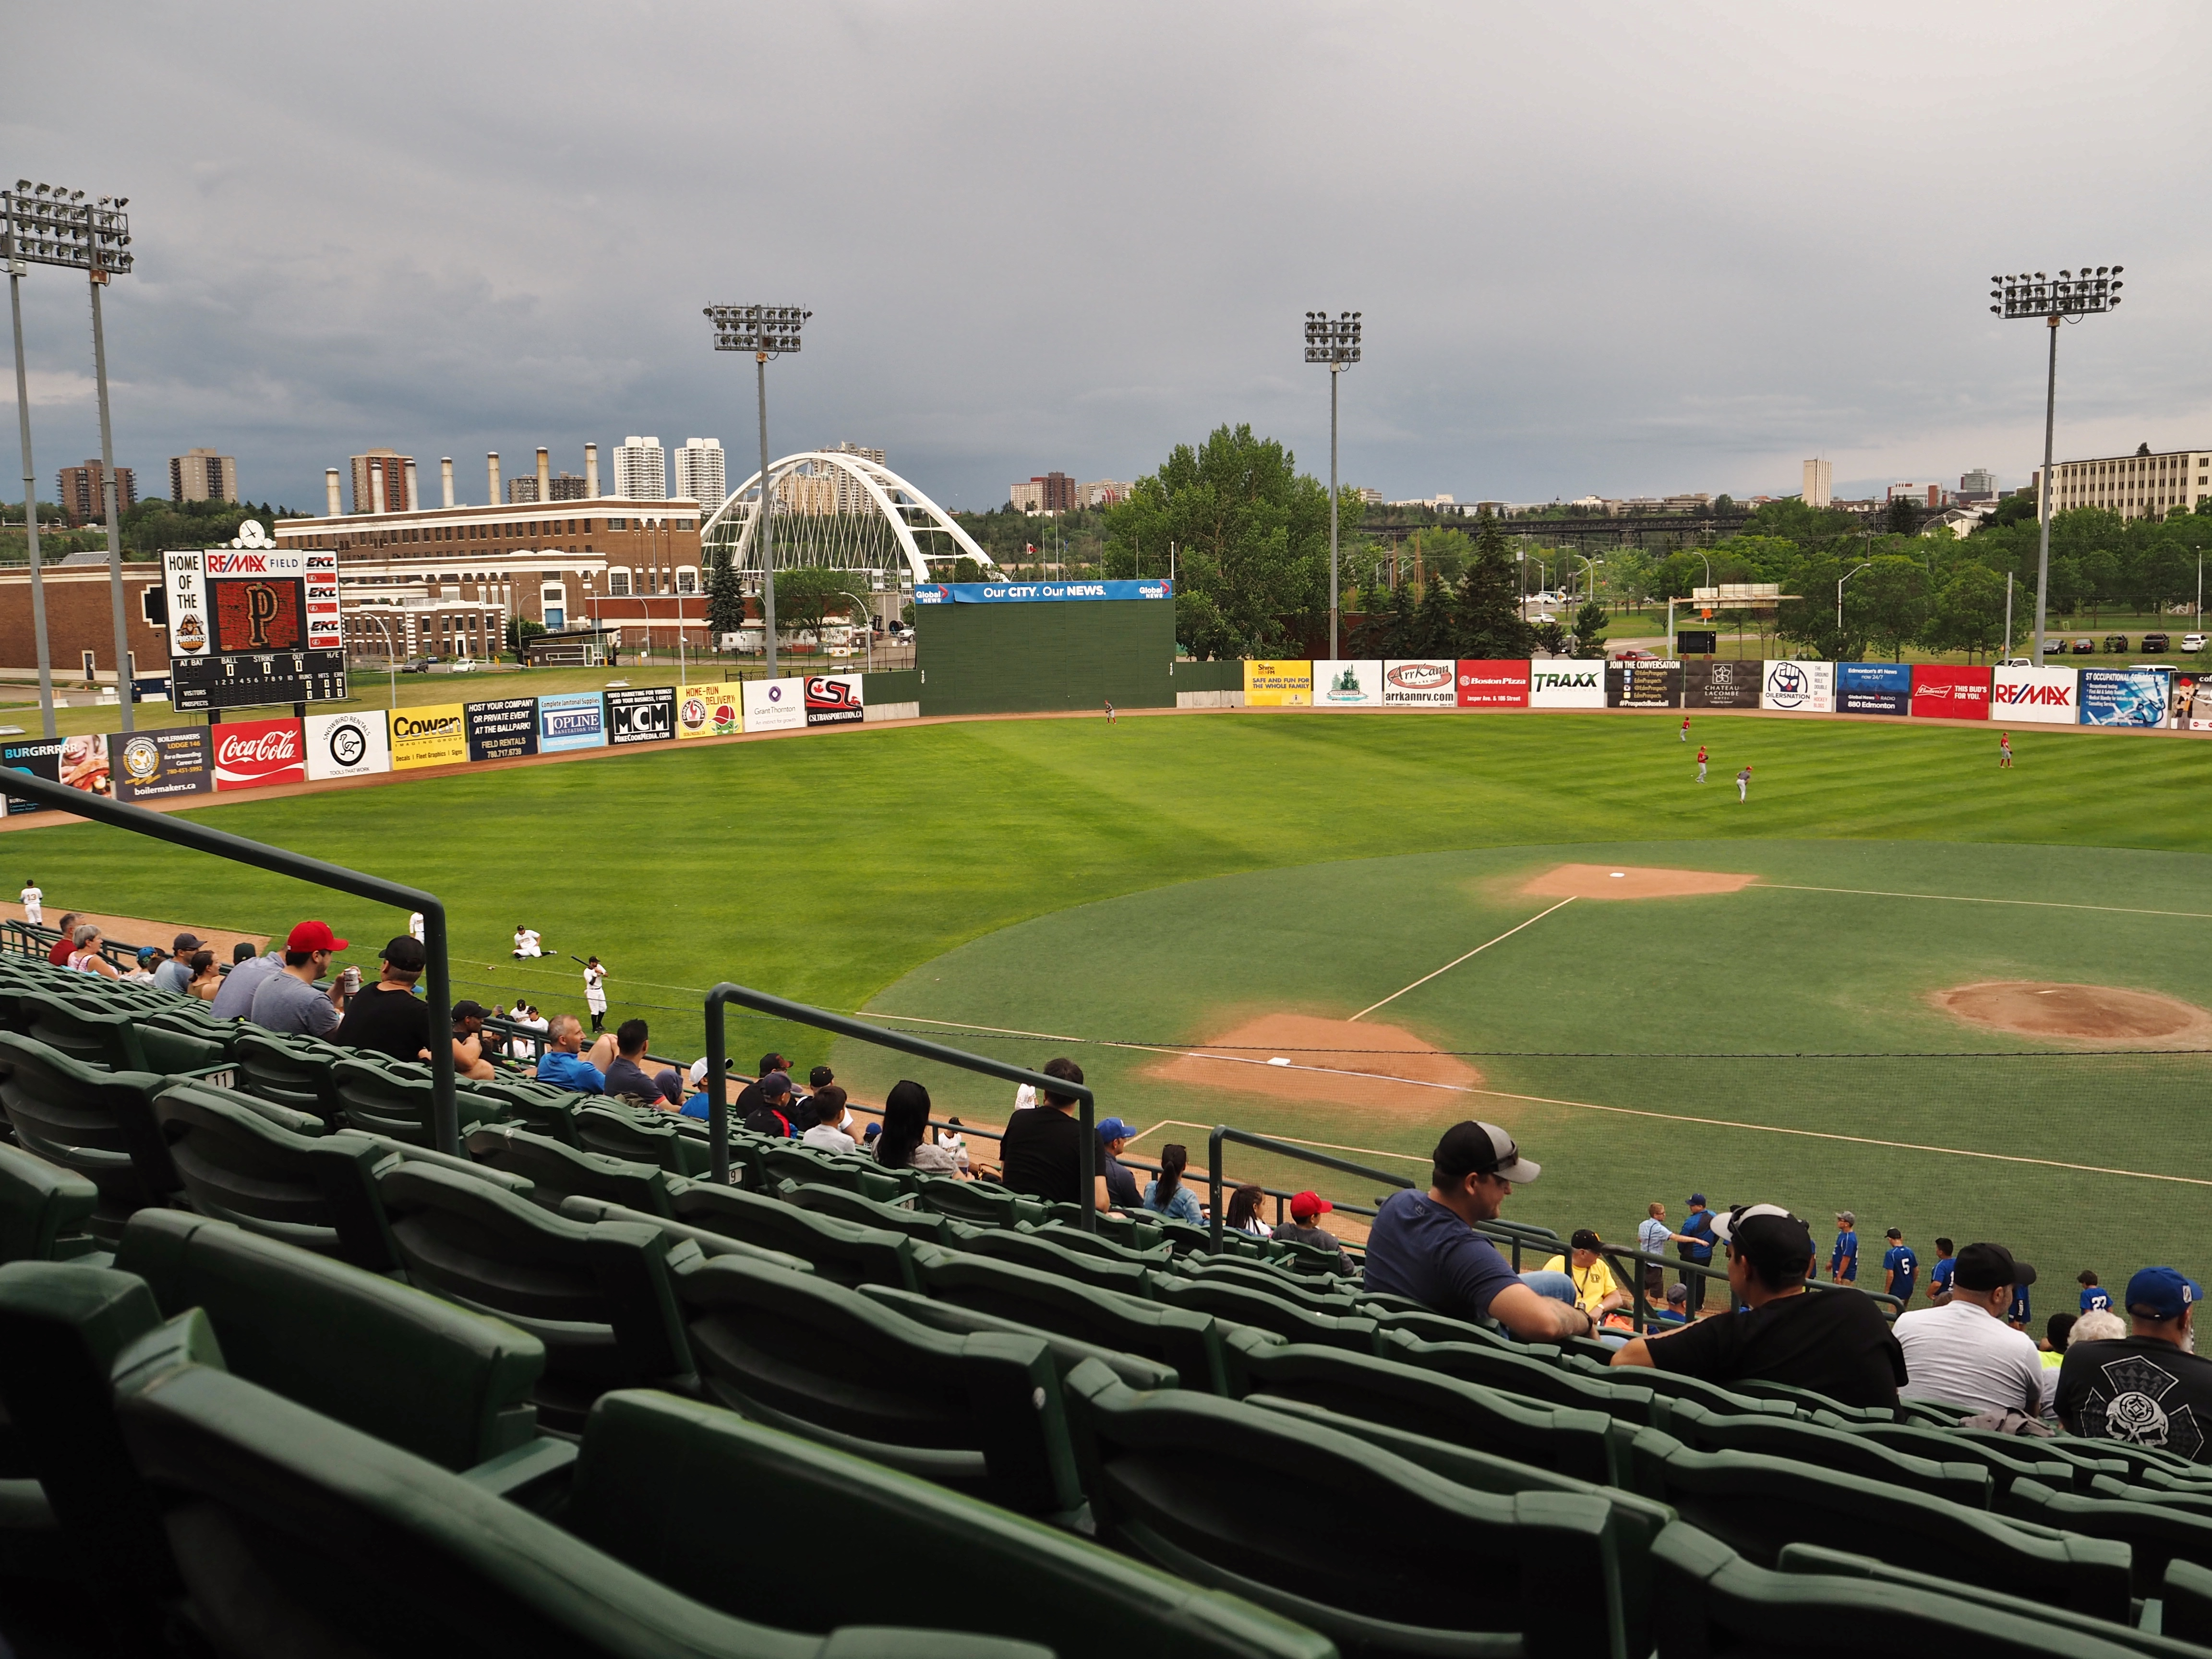 A Night of Edmonton Baseball Action